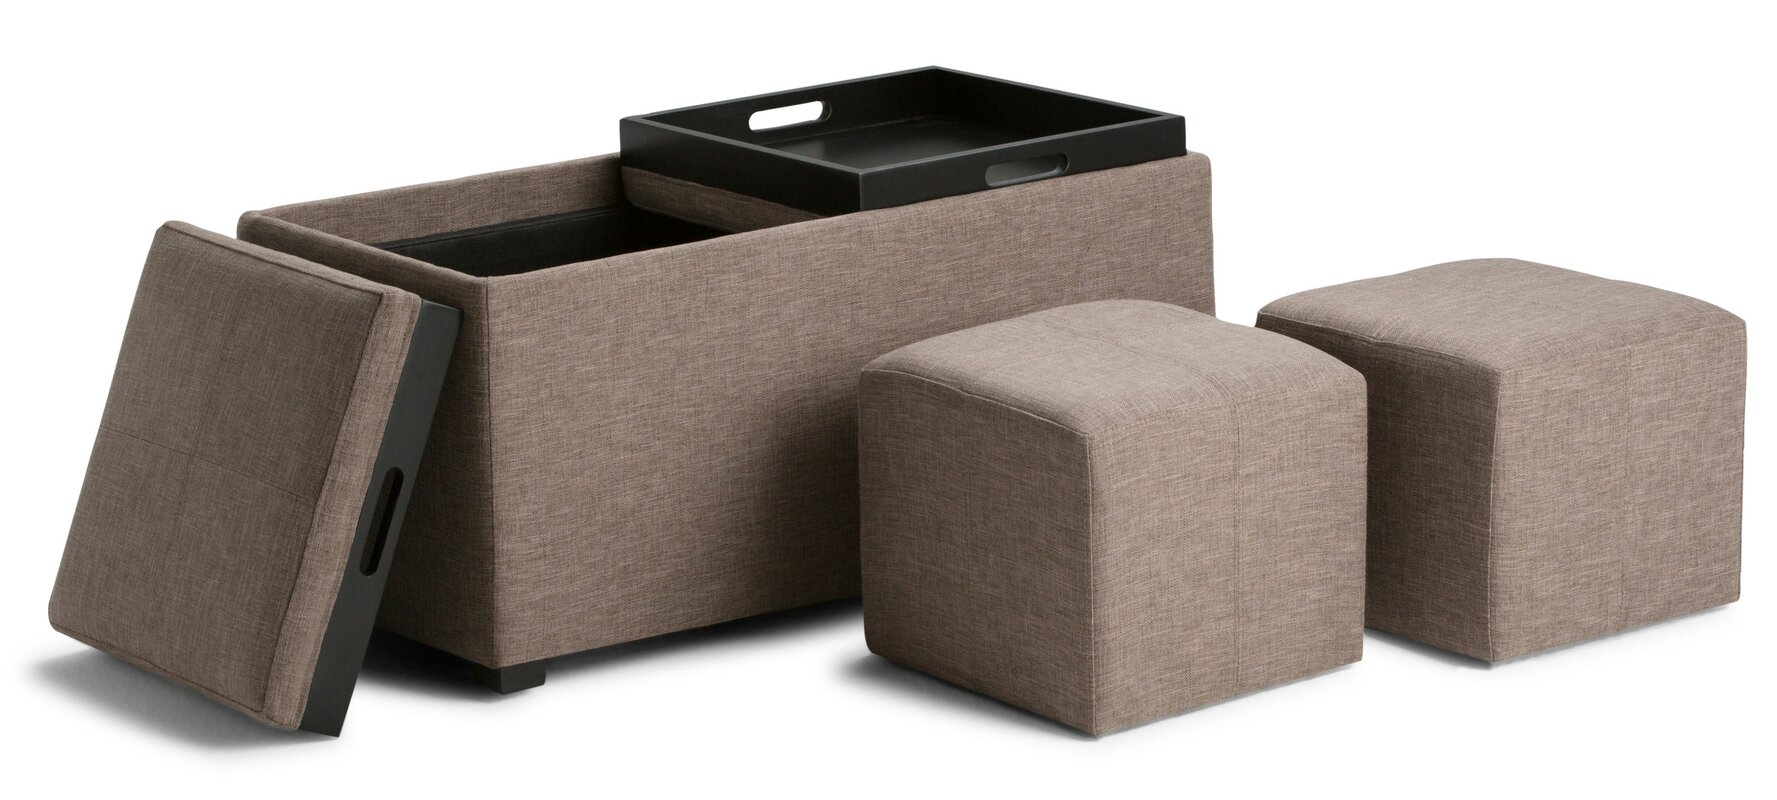 Simpli home avalon 5 piece storage ottoman set reviews for Storage ottoman set